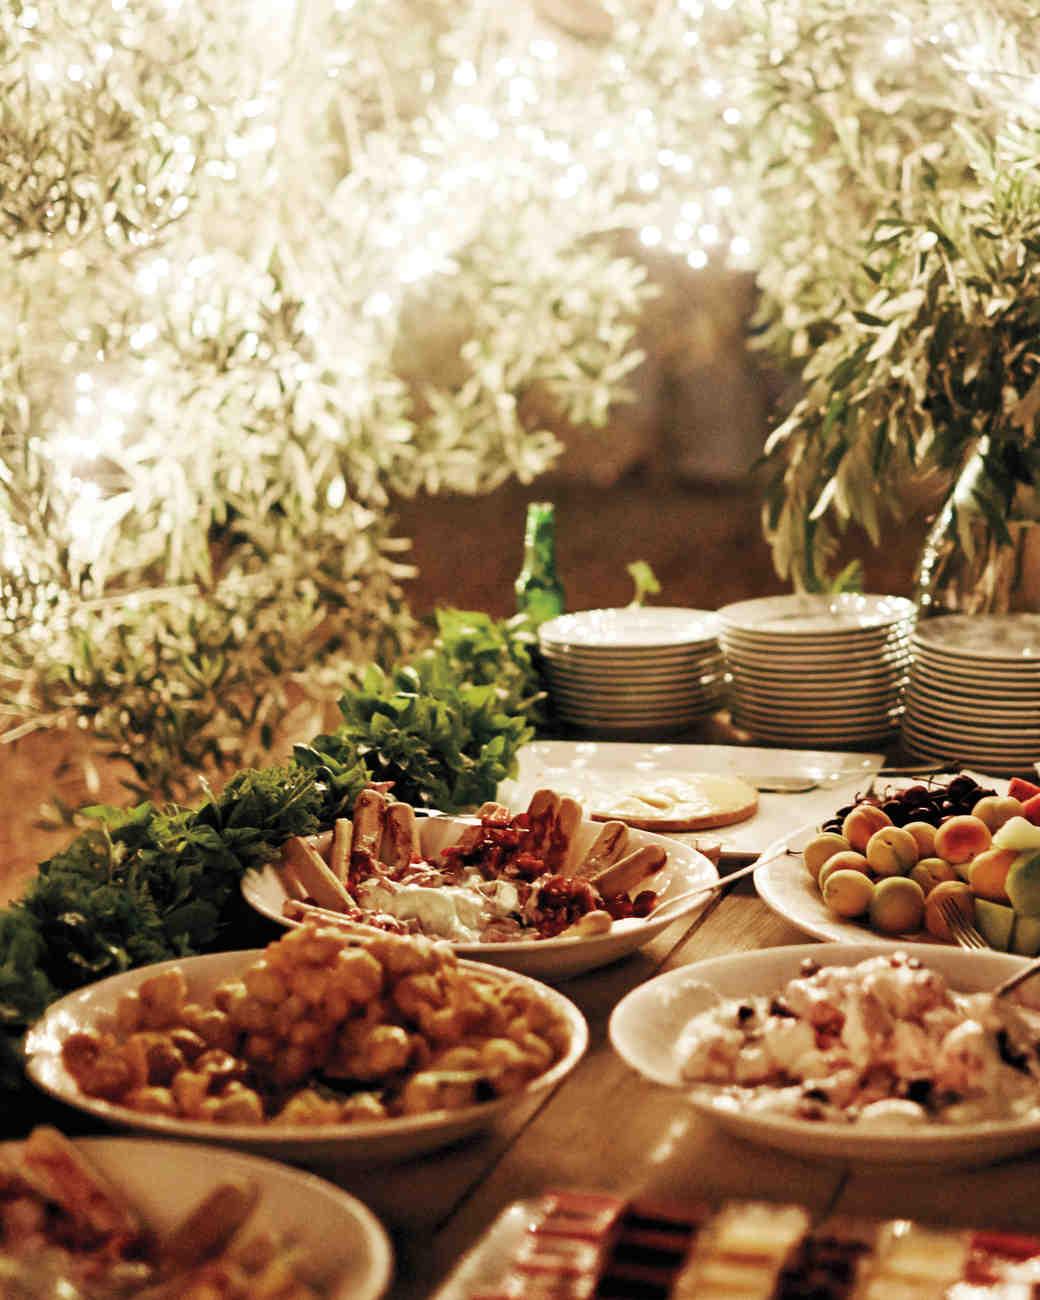 ana-alden-wedding-greece-611a6602-s111821.jpg